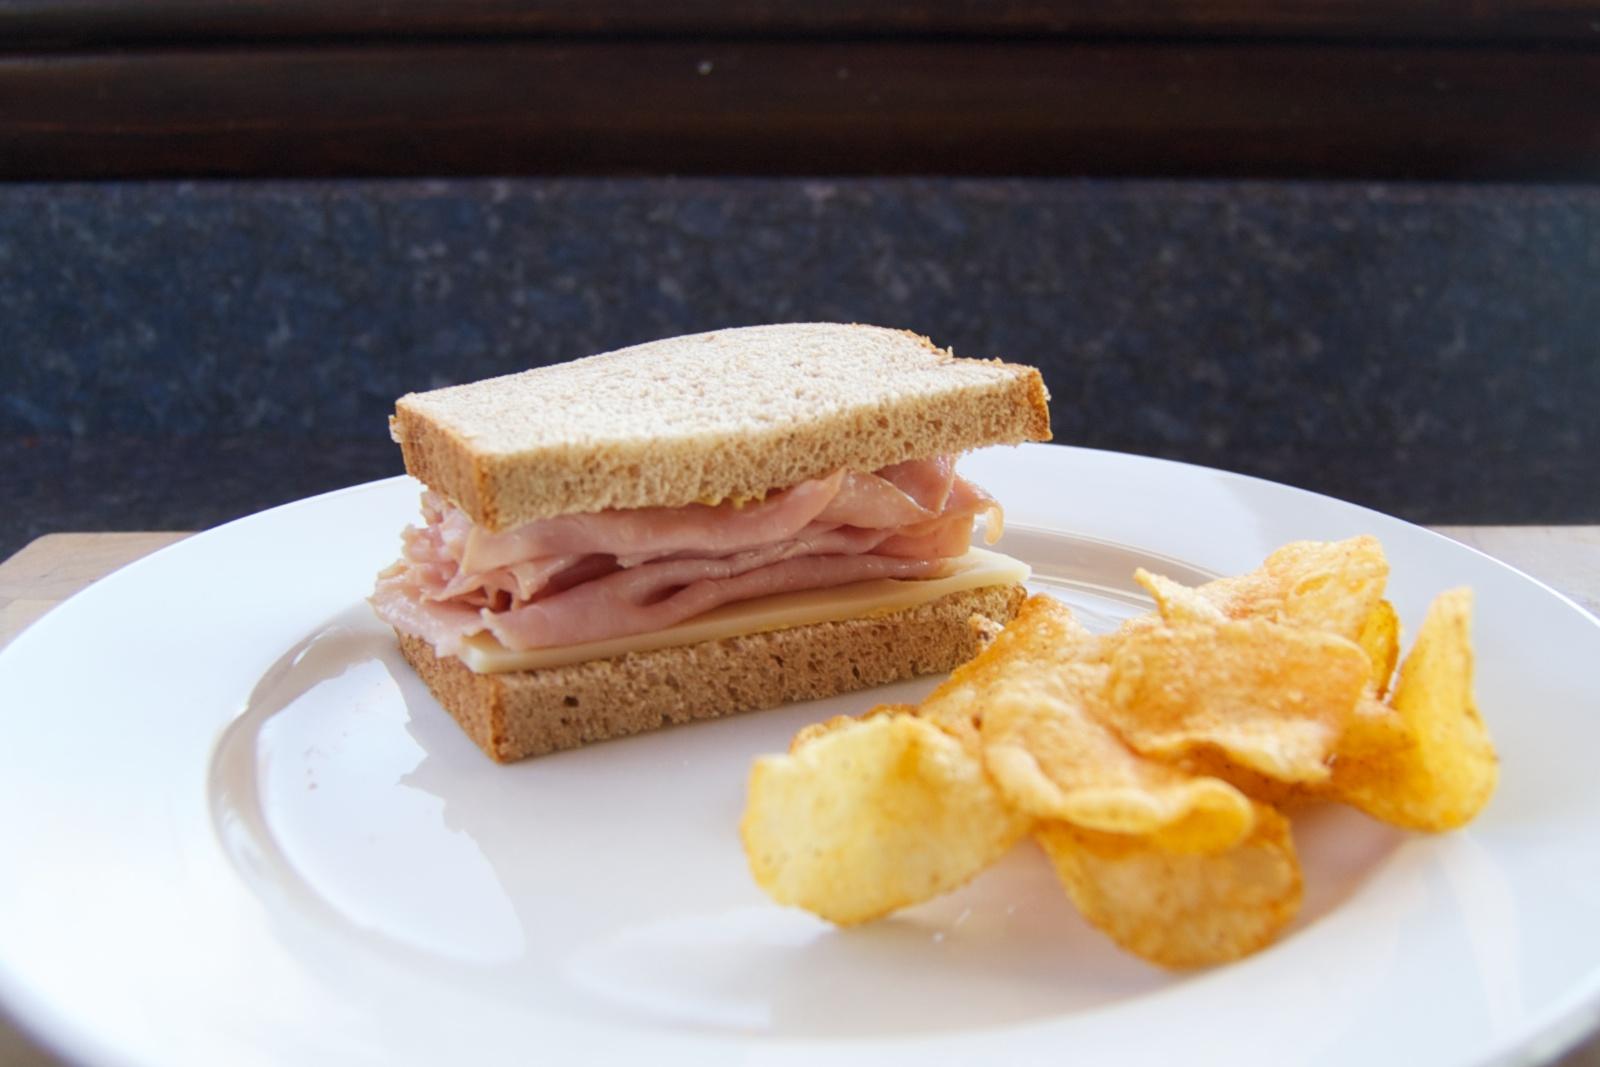 http://blog.rickk.com/food/2013/01/26/ate.2013.01.26.l.jpg